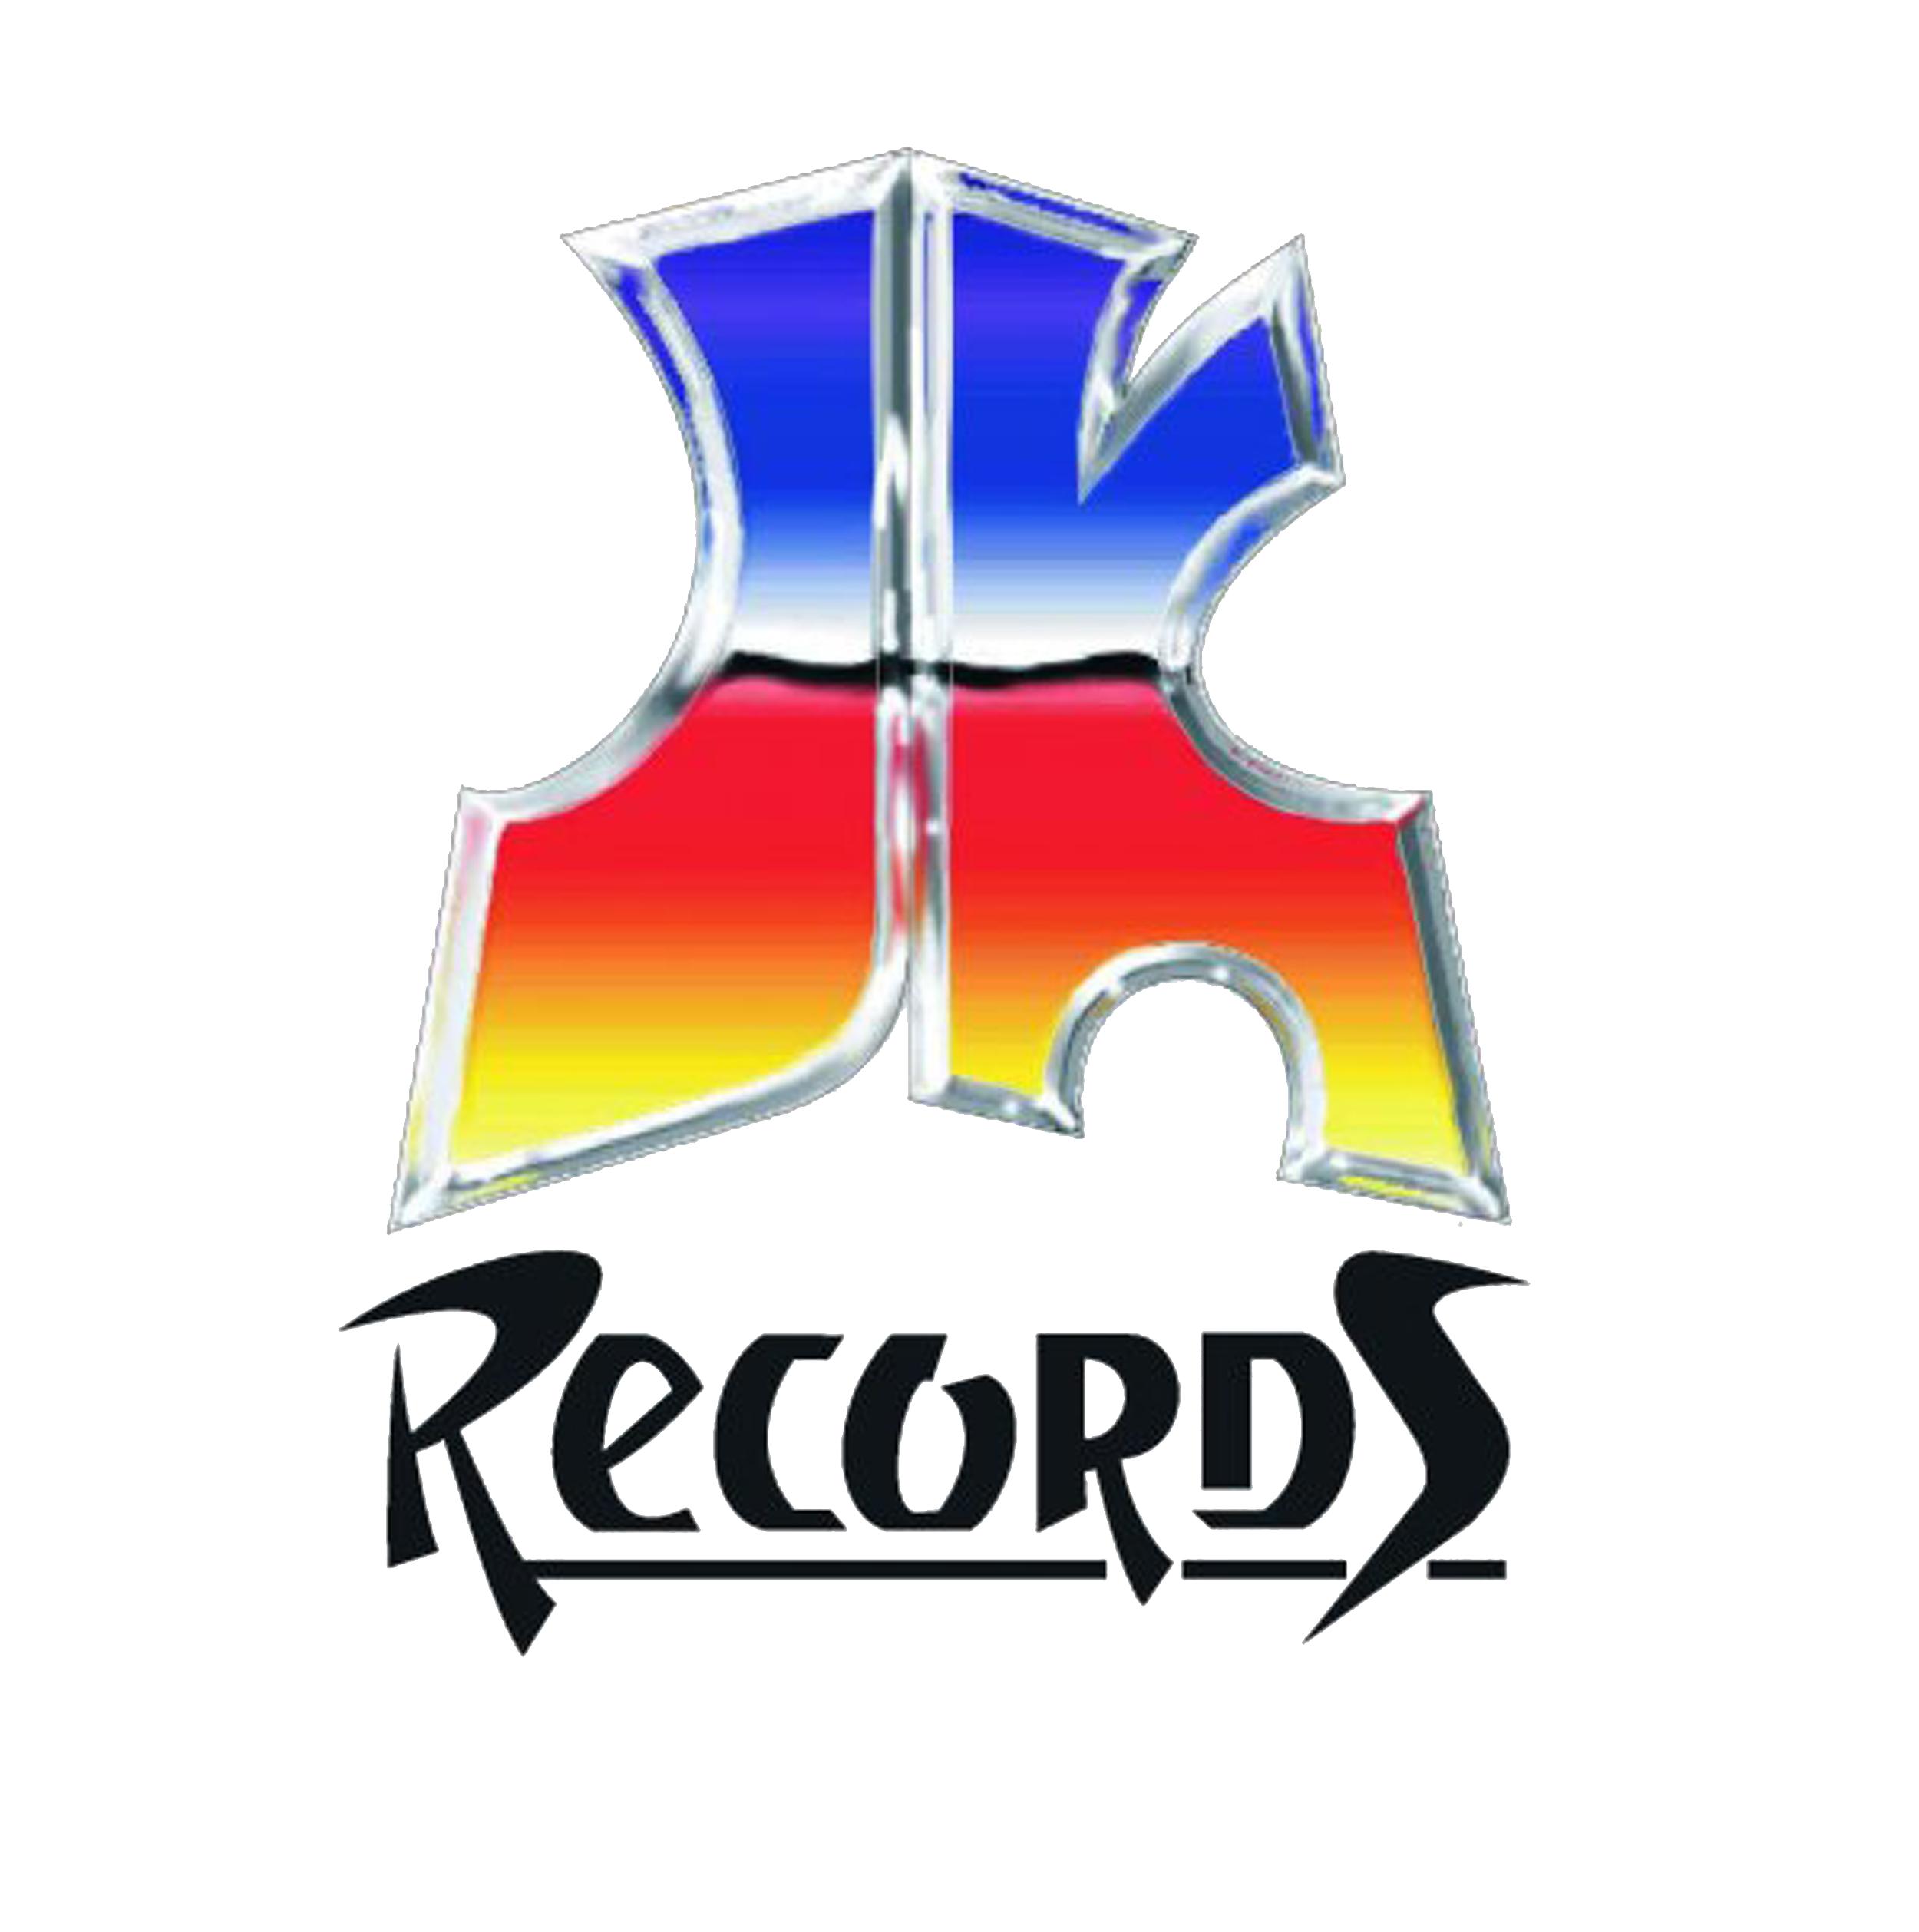 JK Records - Wikipedia bahasa Indonesia, ensiklopedia bebas